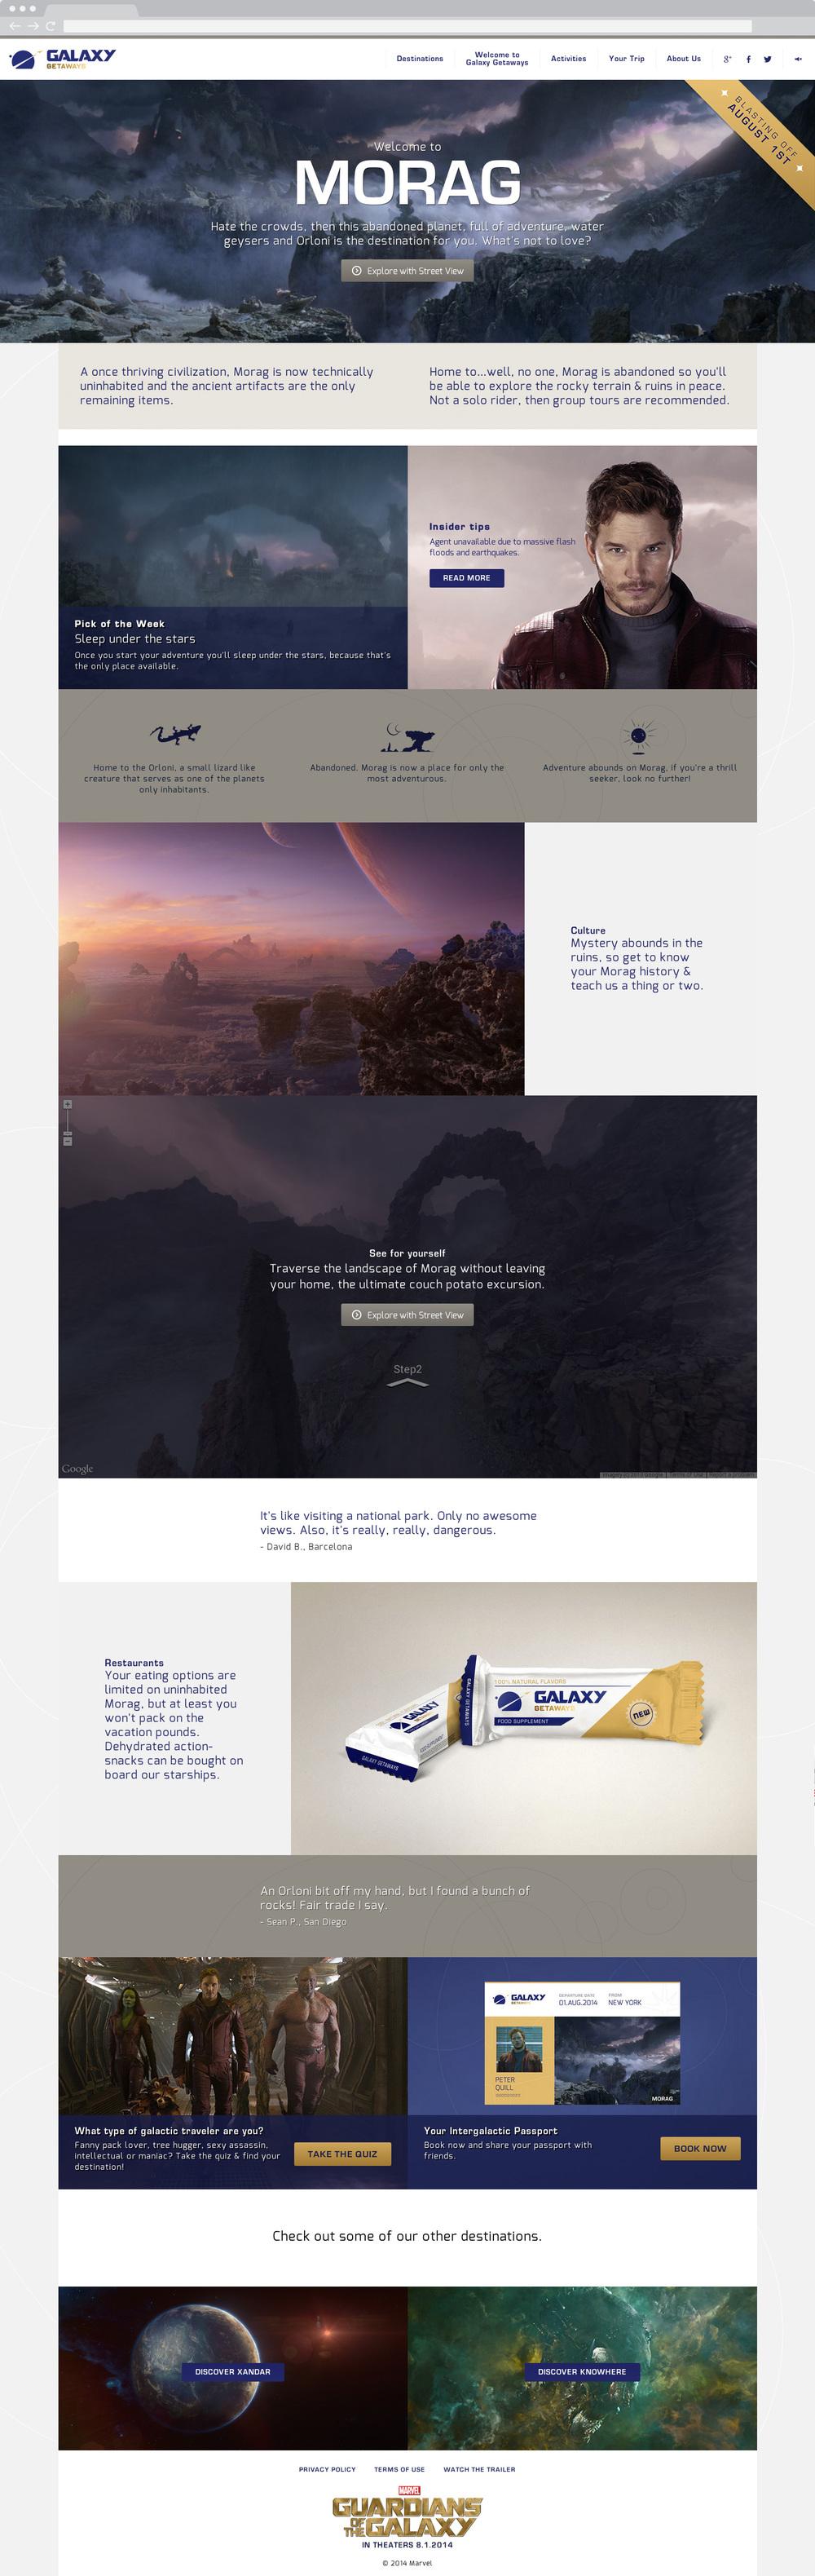 site_2.jpg